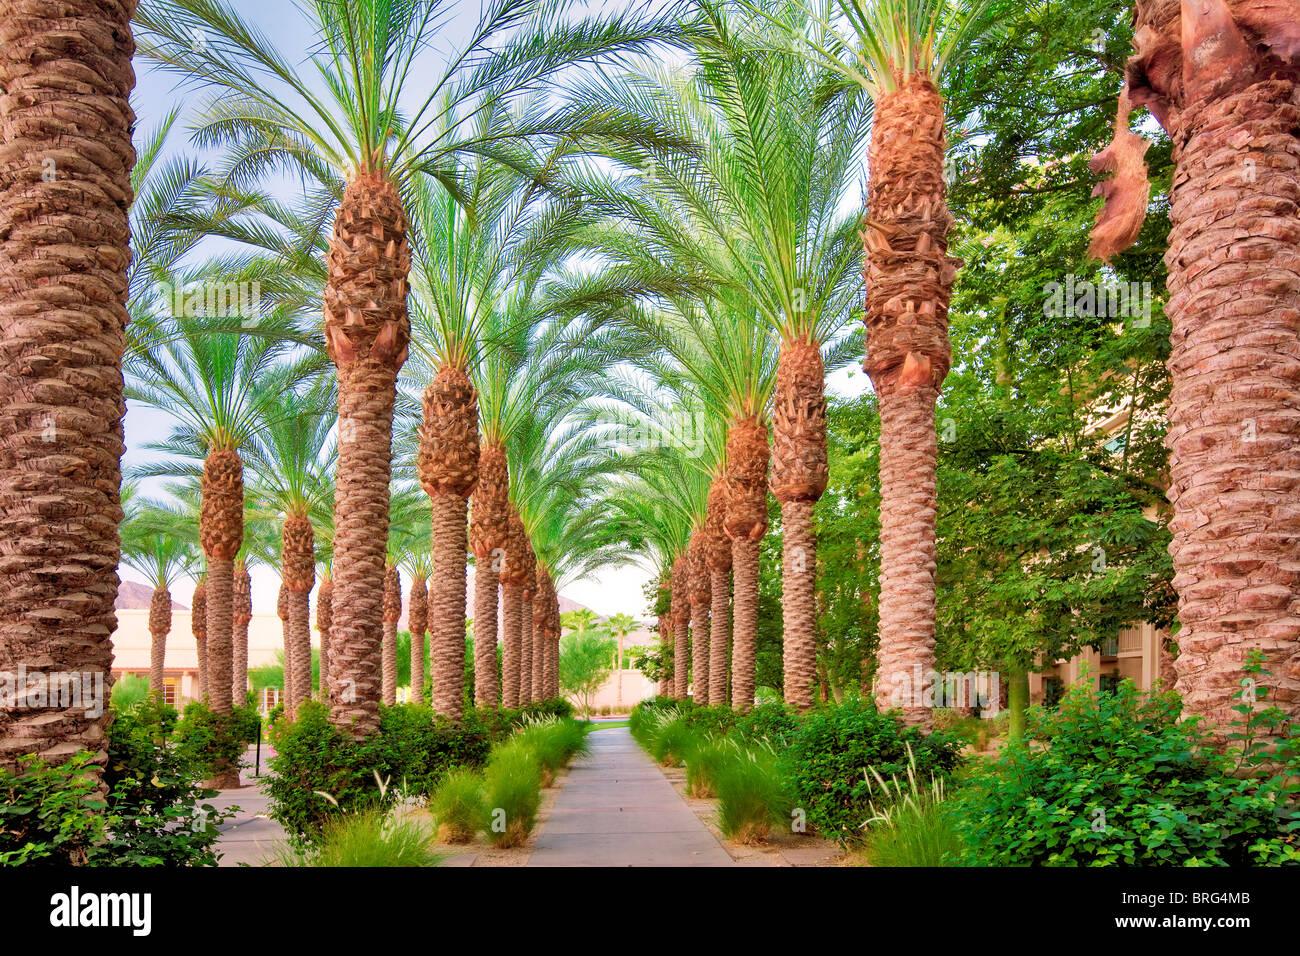 Palm, von Bäumen gesäumten Weg. Hyatt. Indian Wells, Kalifornien Stockbild